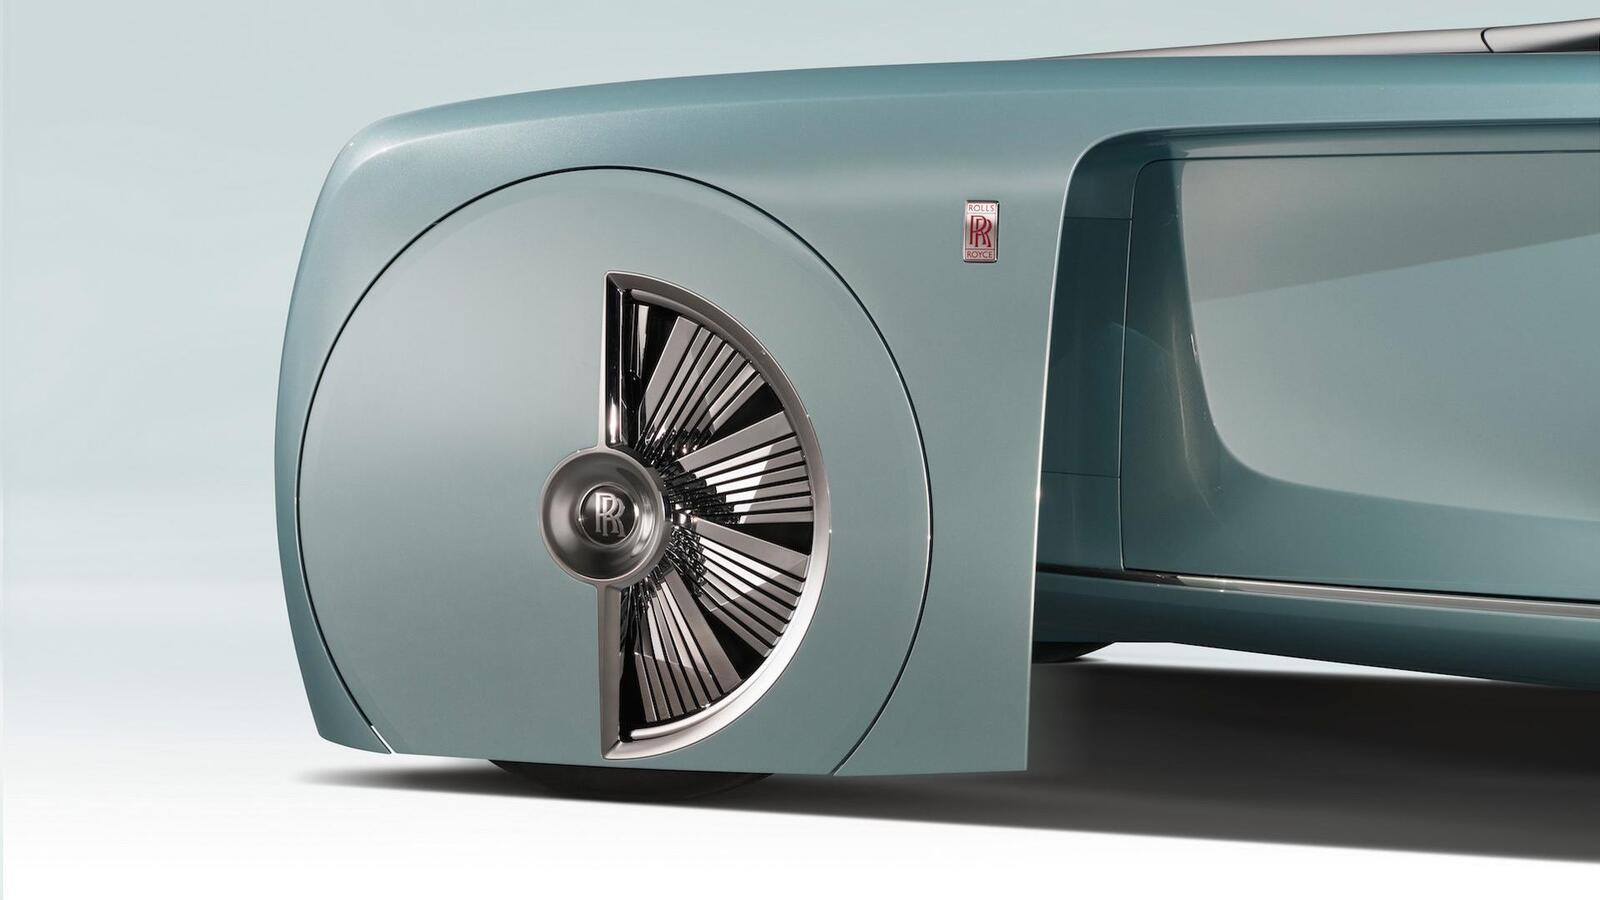 rolls-royce-vision-next-100-concept11.jpg